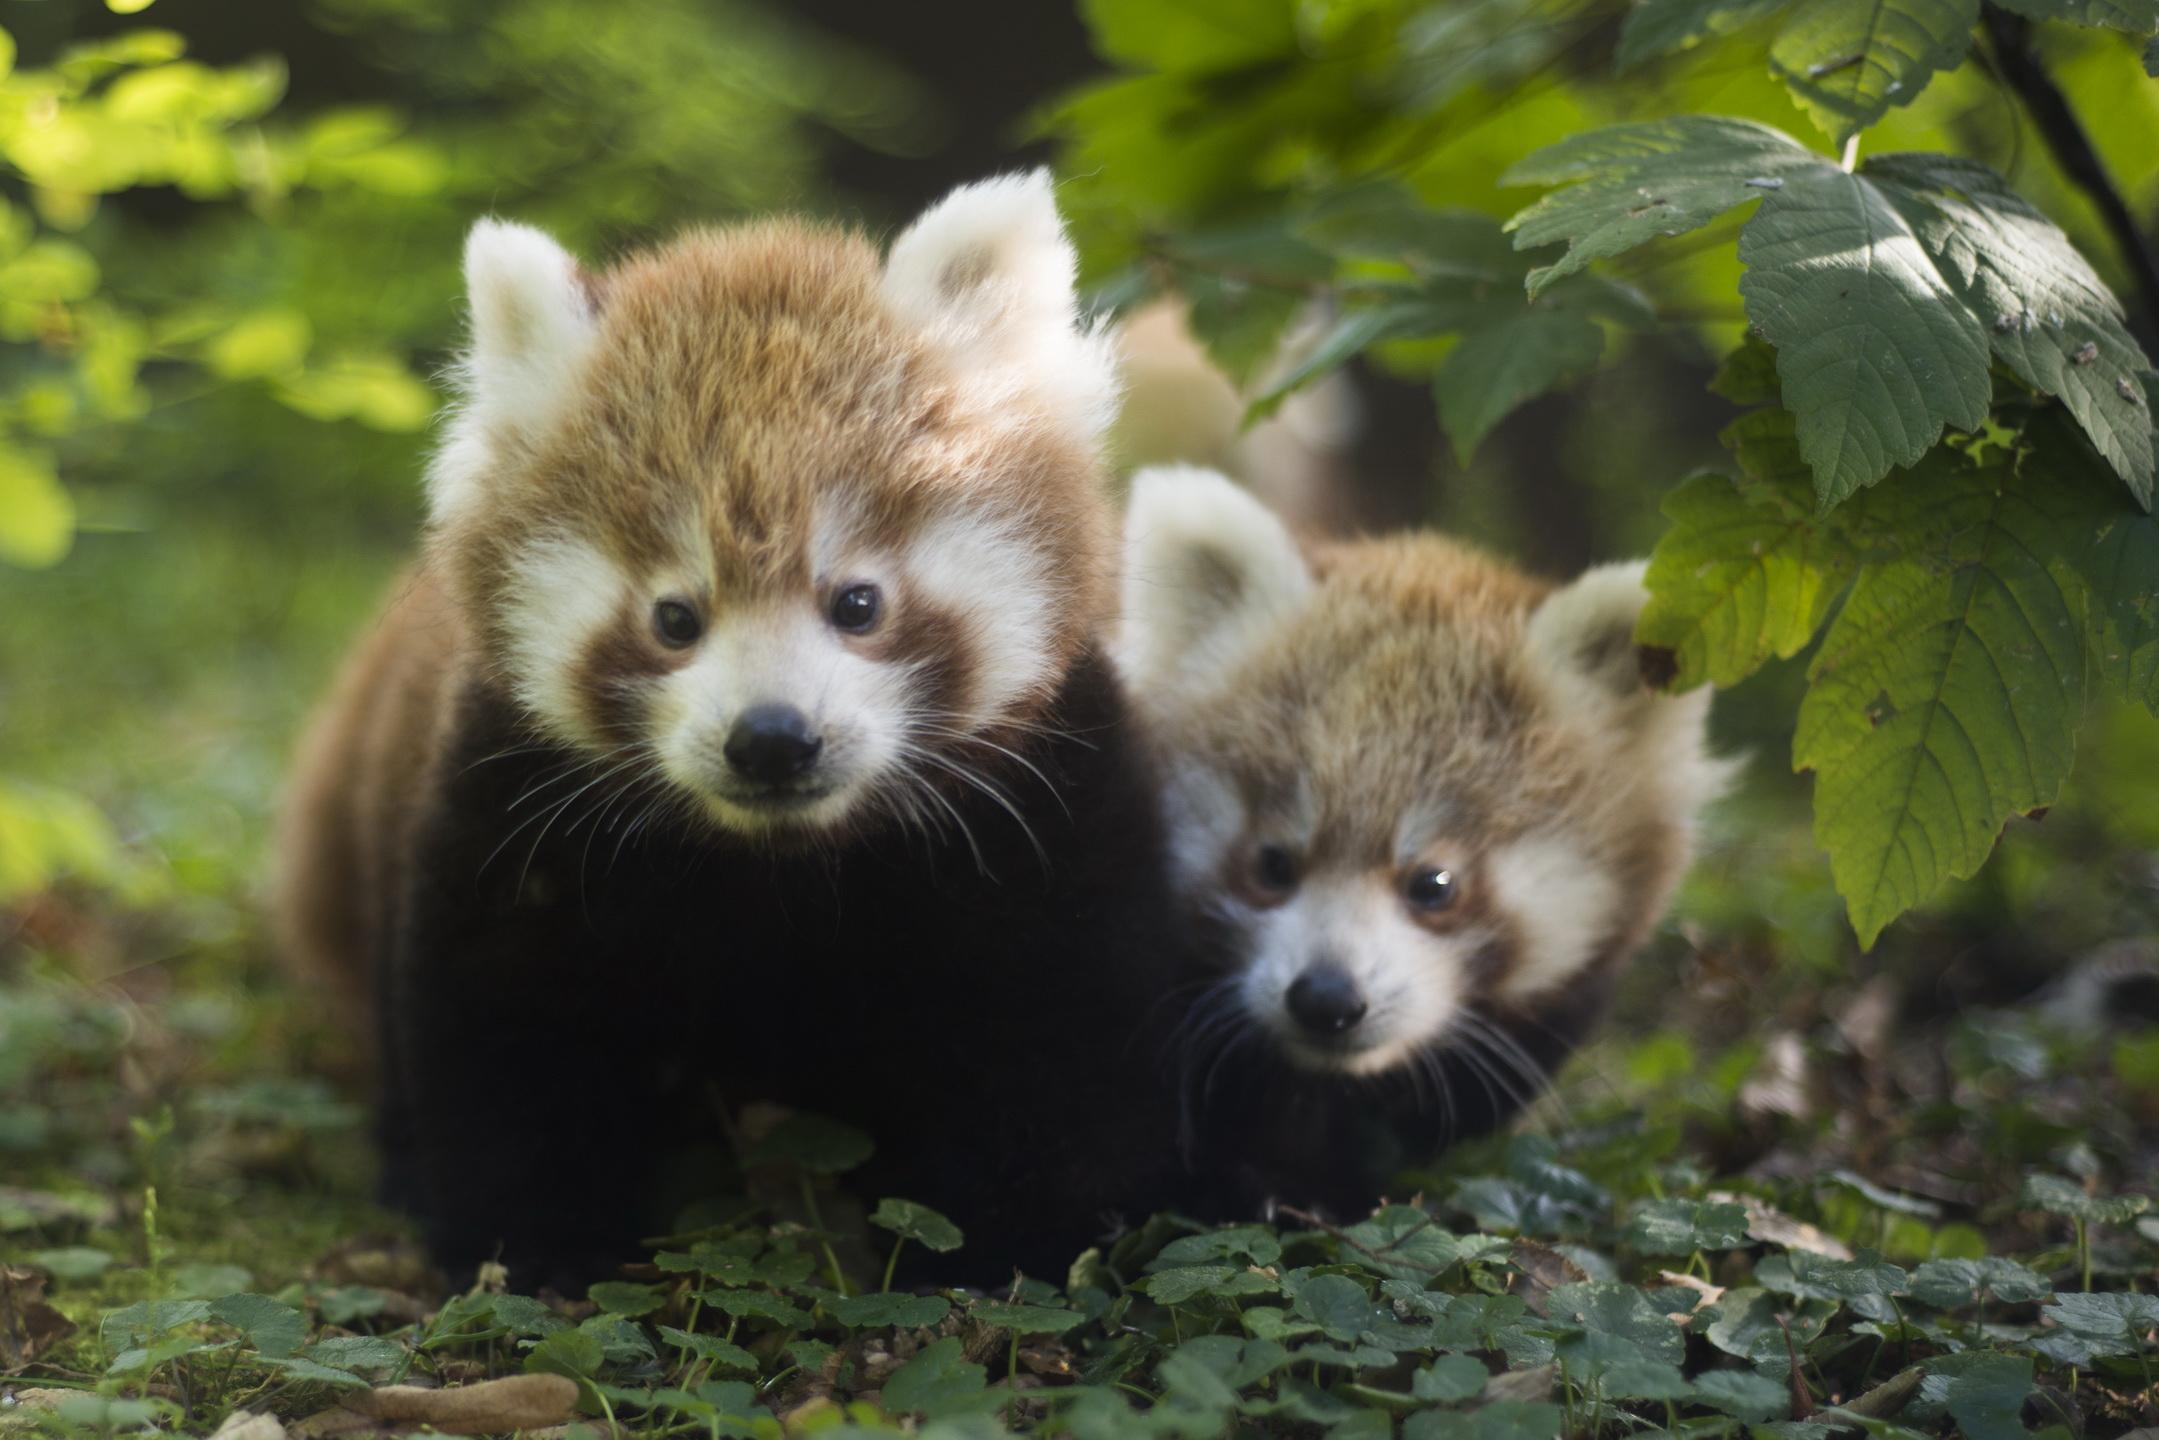 Crvena panda Ema ima pune ruke posla oko malenih blizanaca